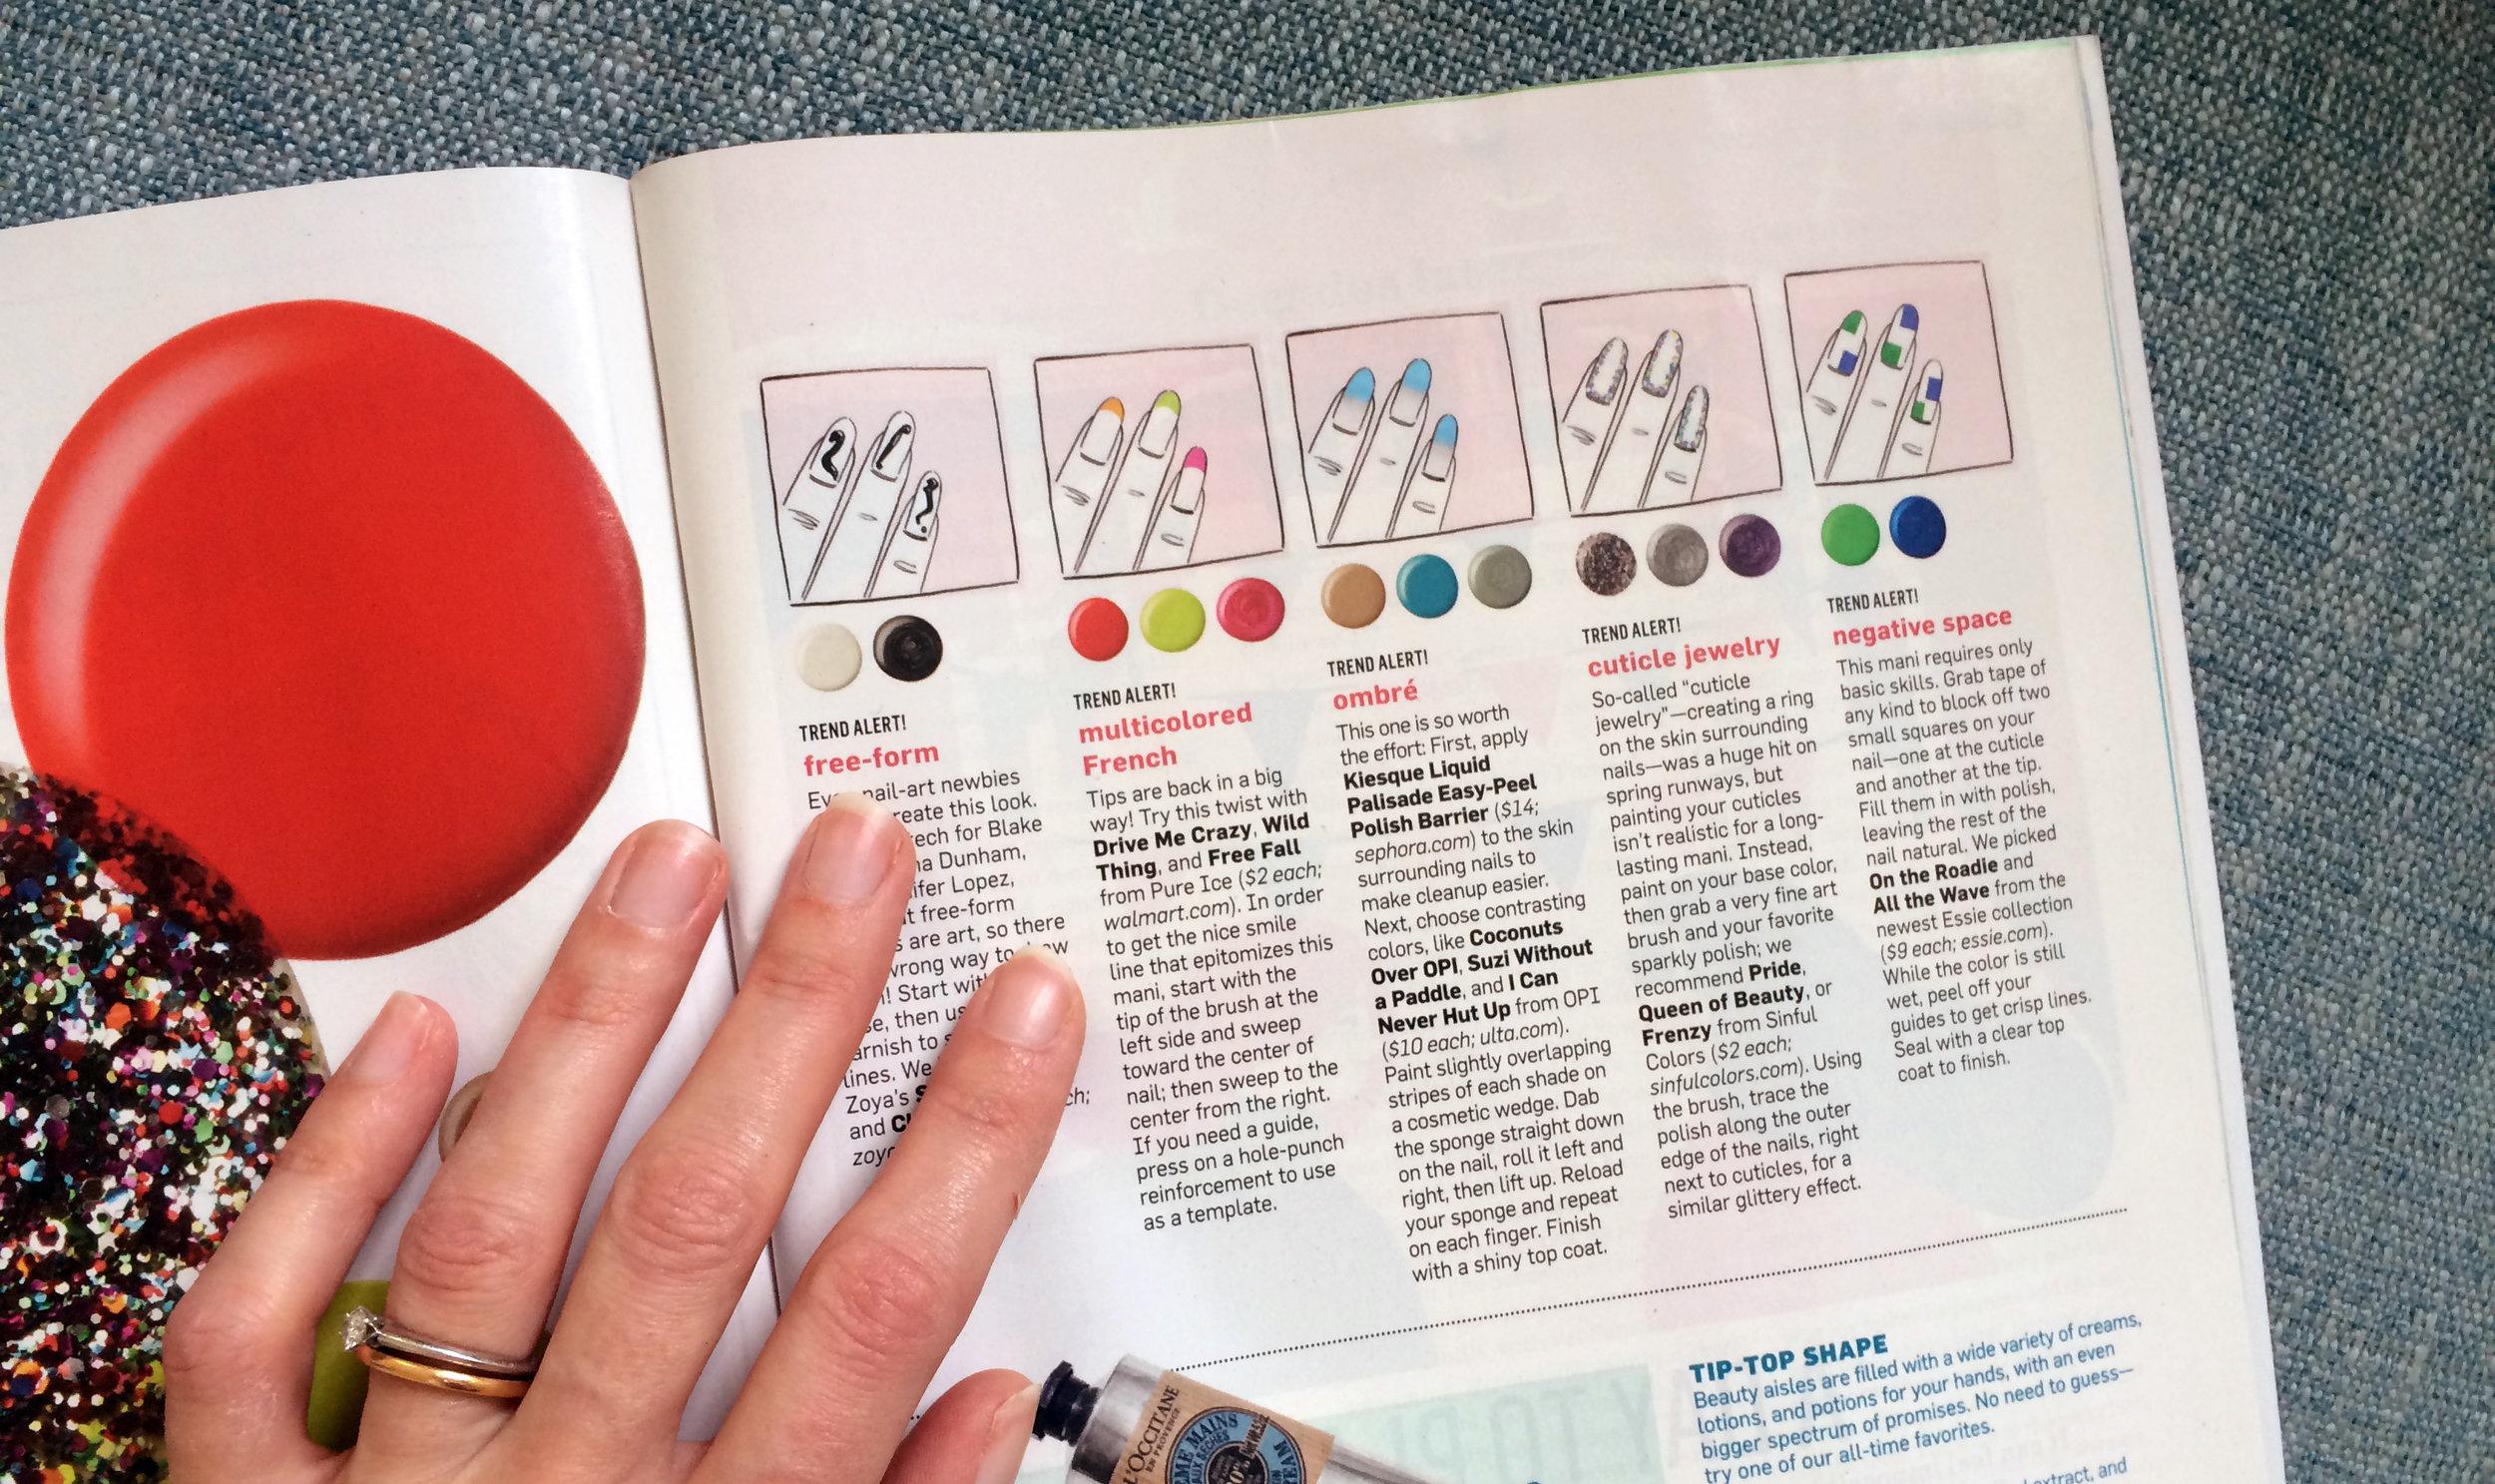 Family Fun magazine illustration commission b y Willa Gebbie